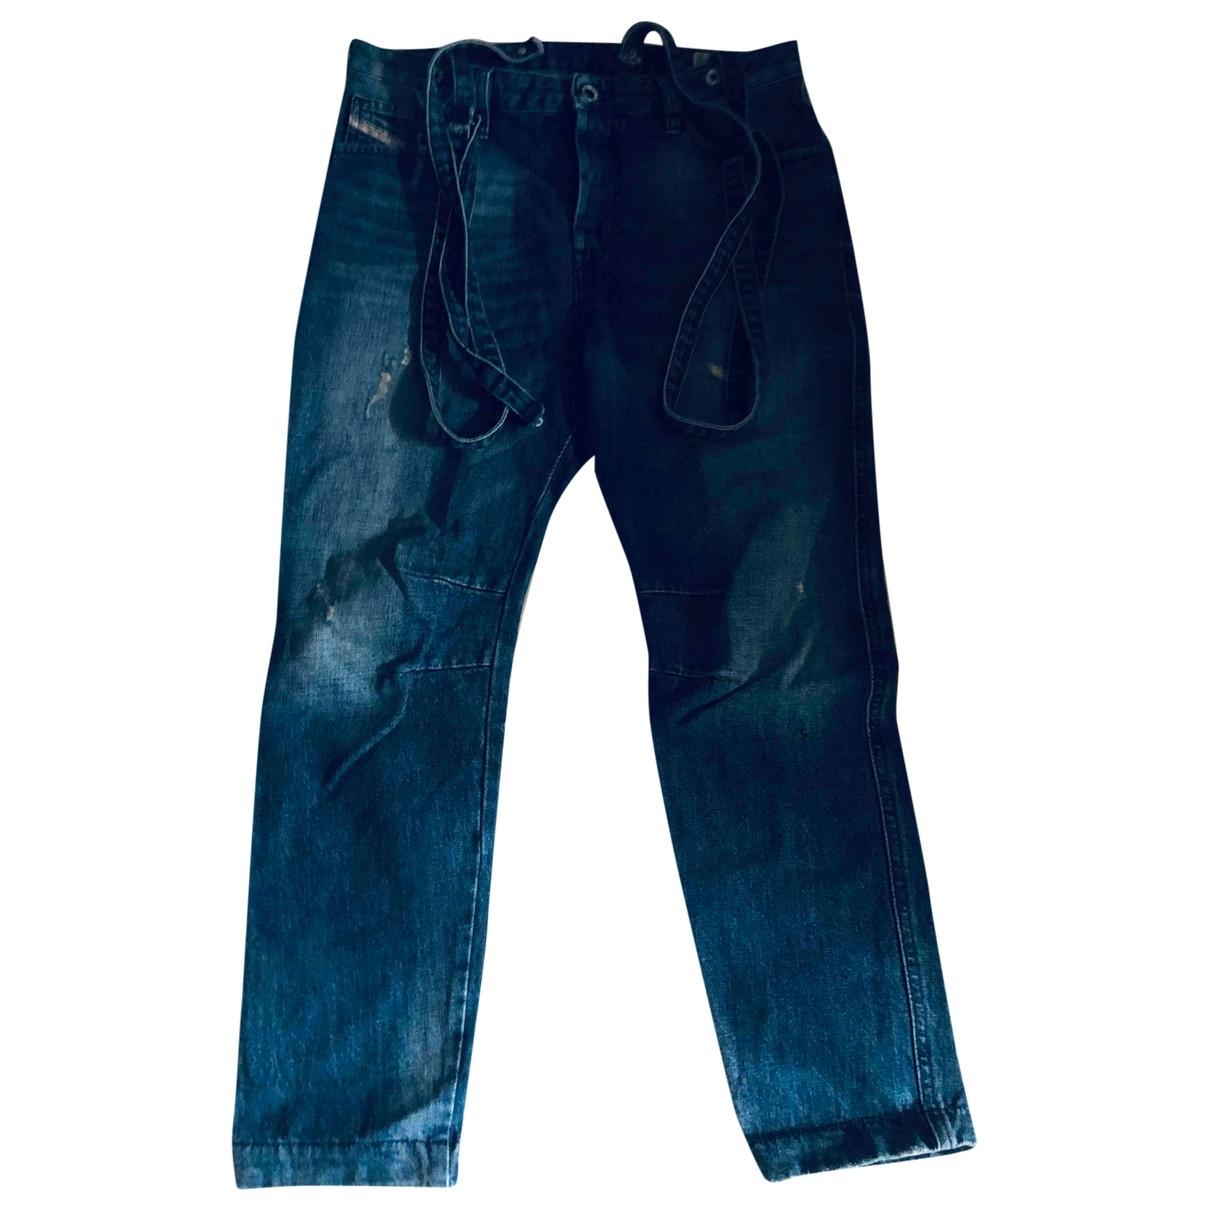 Diesel - Jean   pour femme en denim